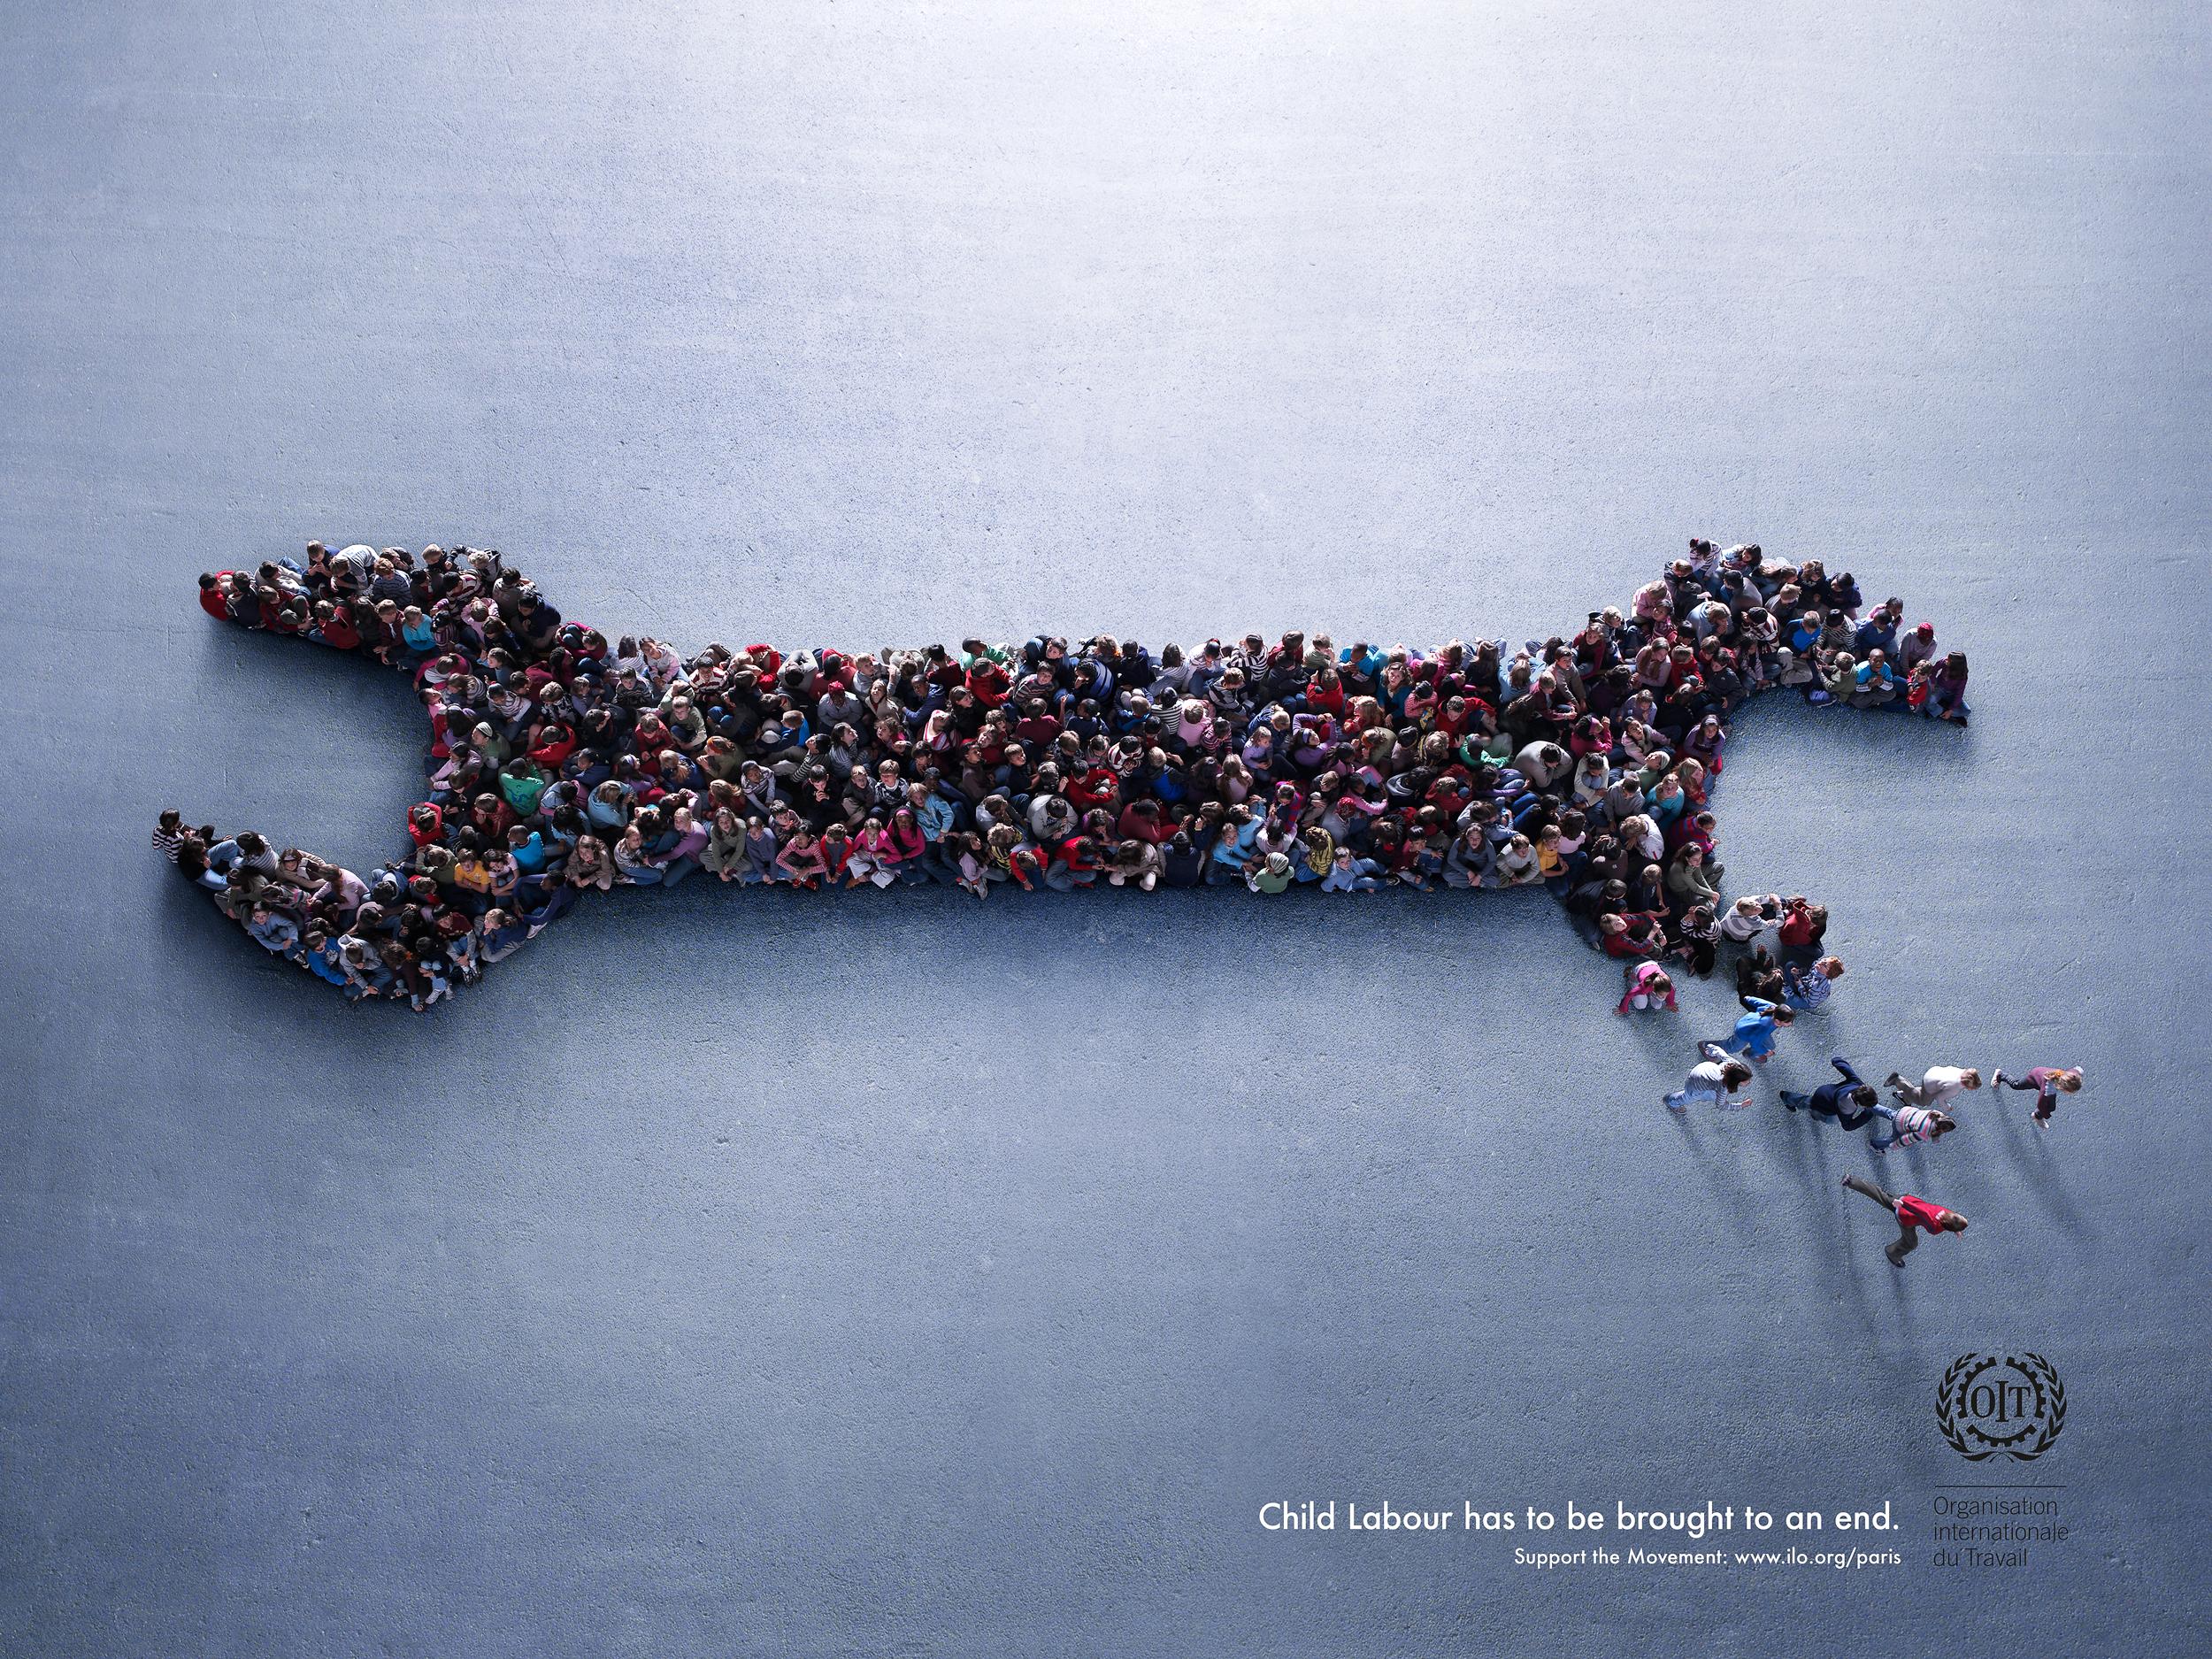 Image Kampagne Fotograf Zürich | ILO / Banish Child Labour #1